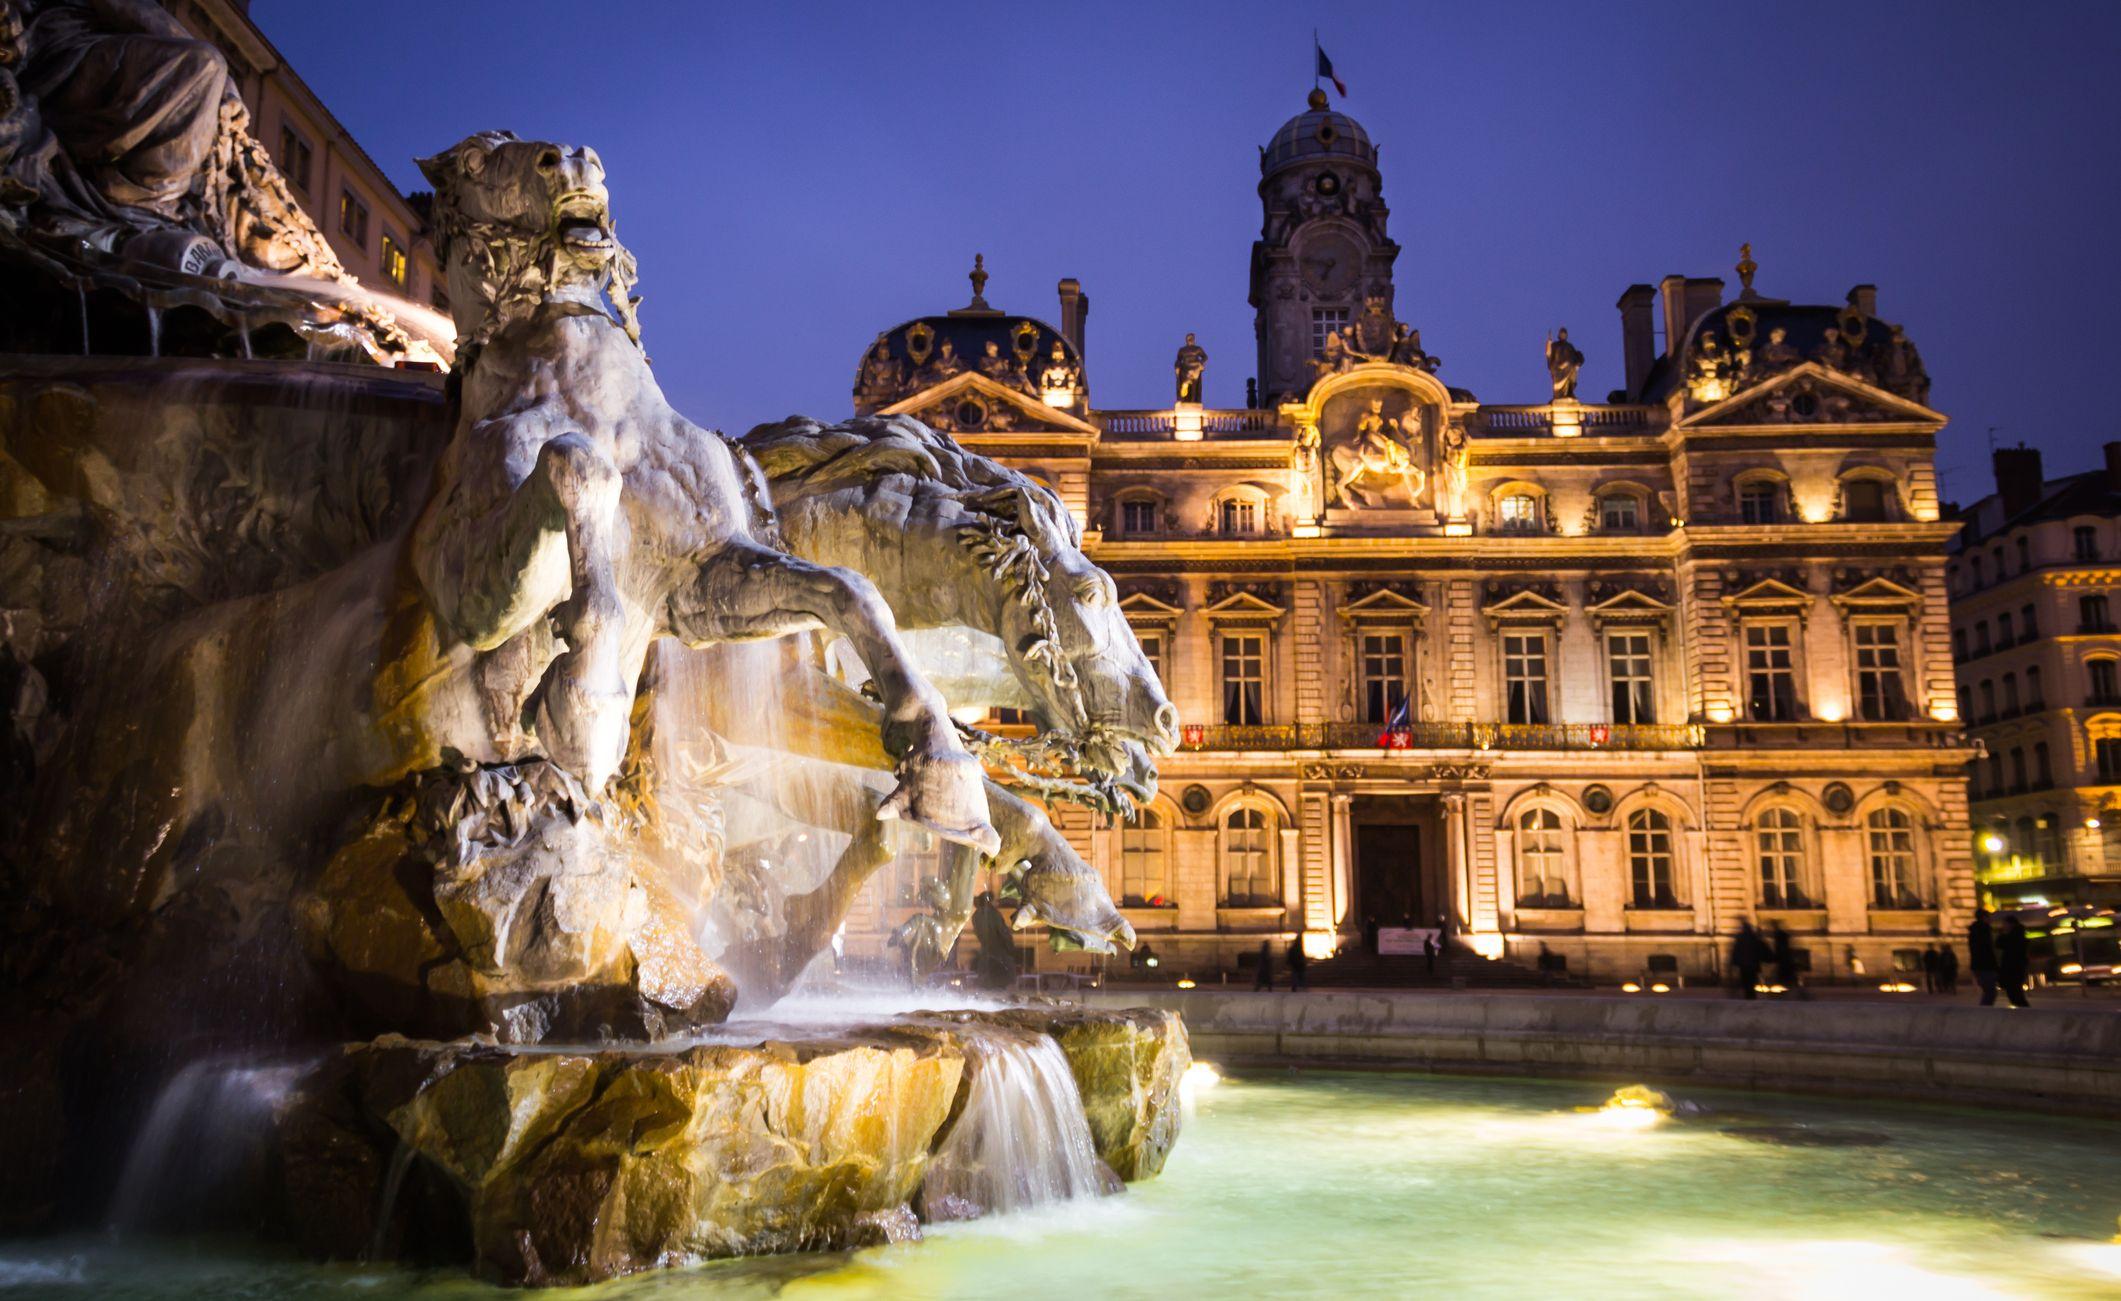 The Bartholdi Fountain and City Hall of Lyon